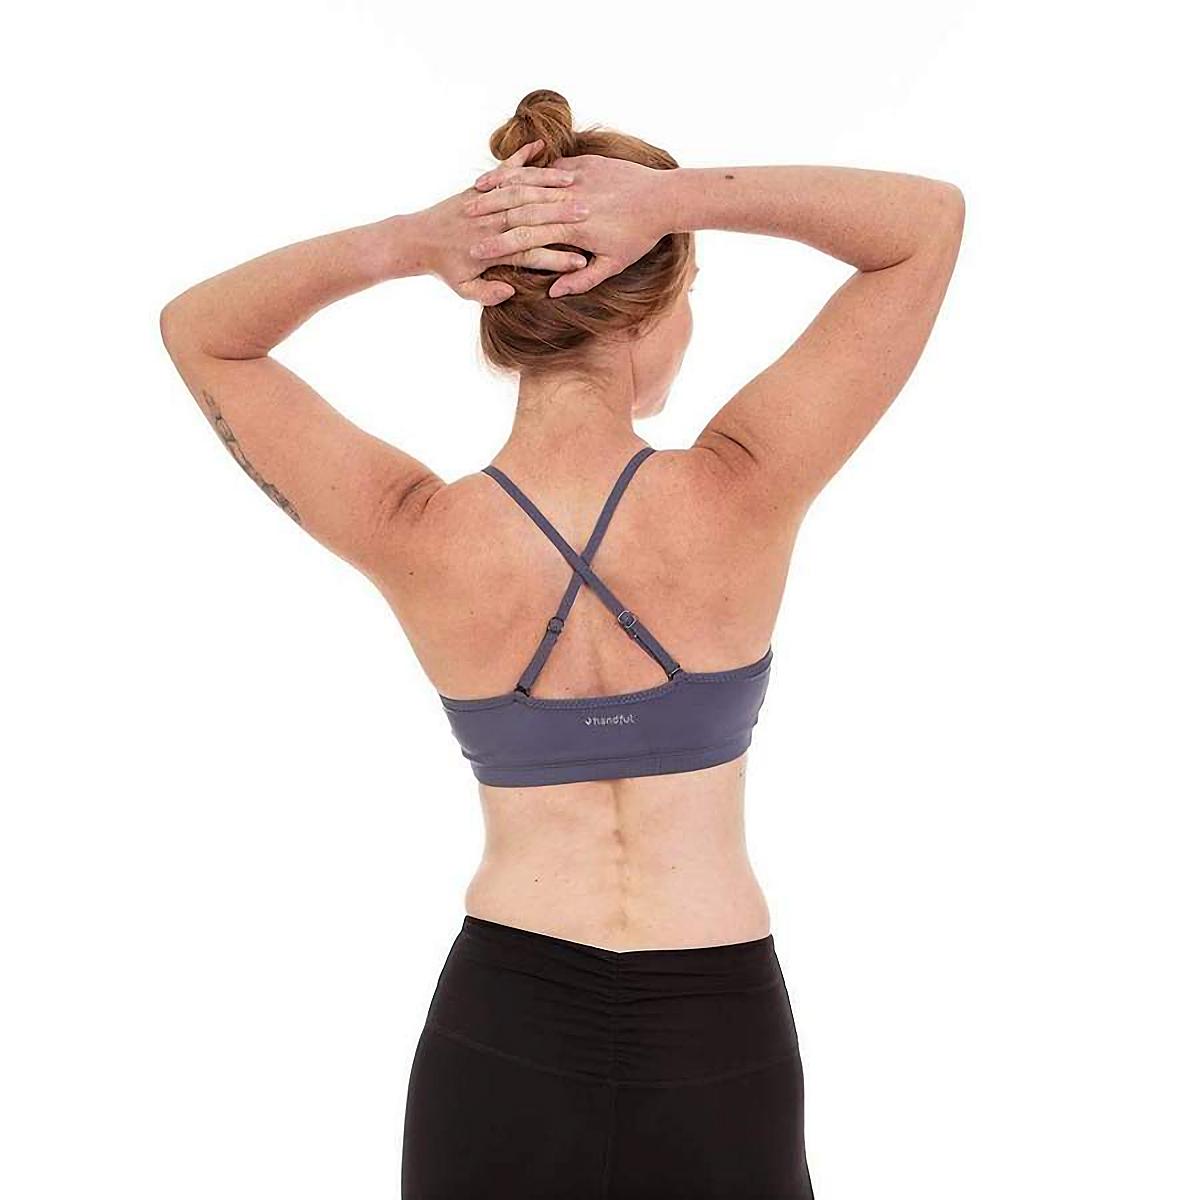 Women's Handful Adjustable Bra - Color: Dreamcatcher - Size: XS, Dreamcatcher, large, image 2